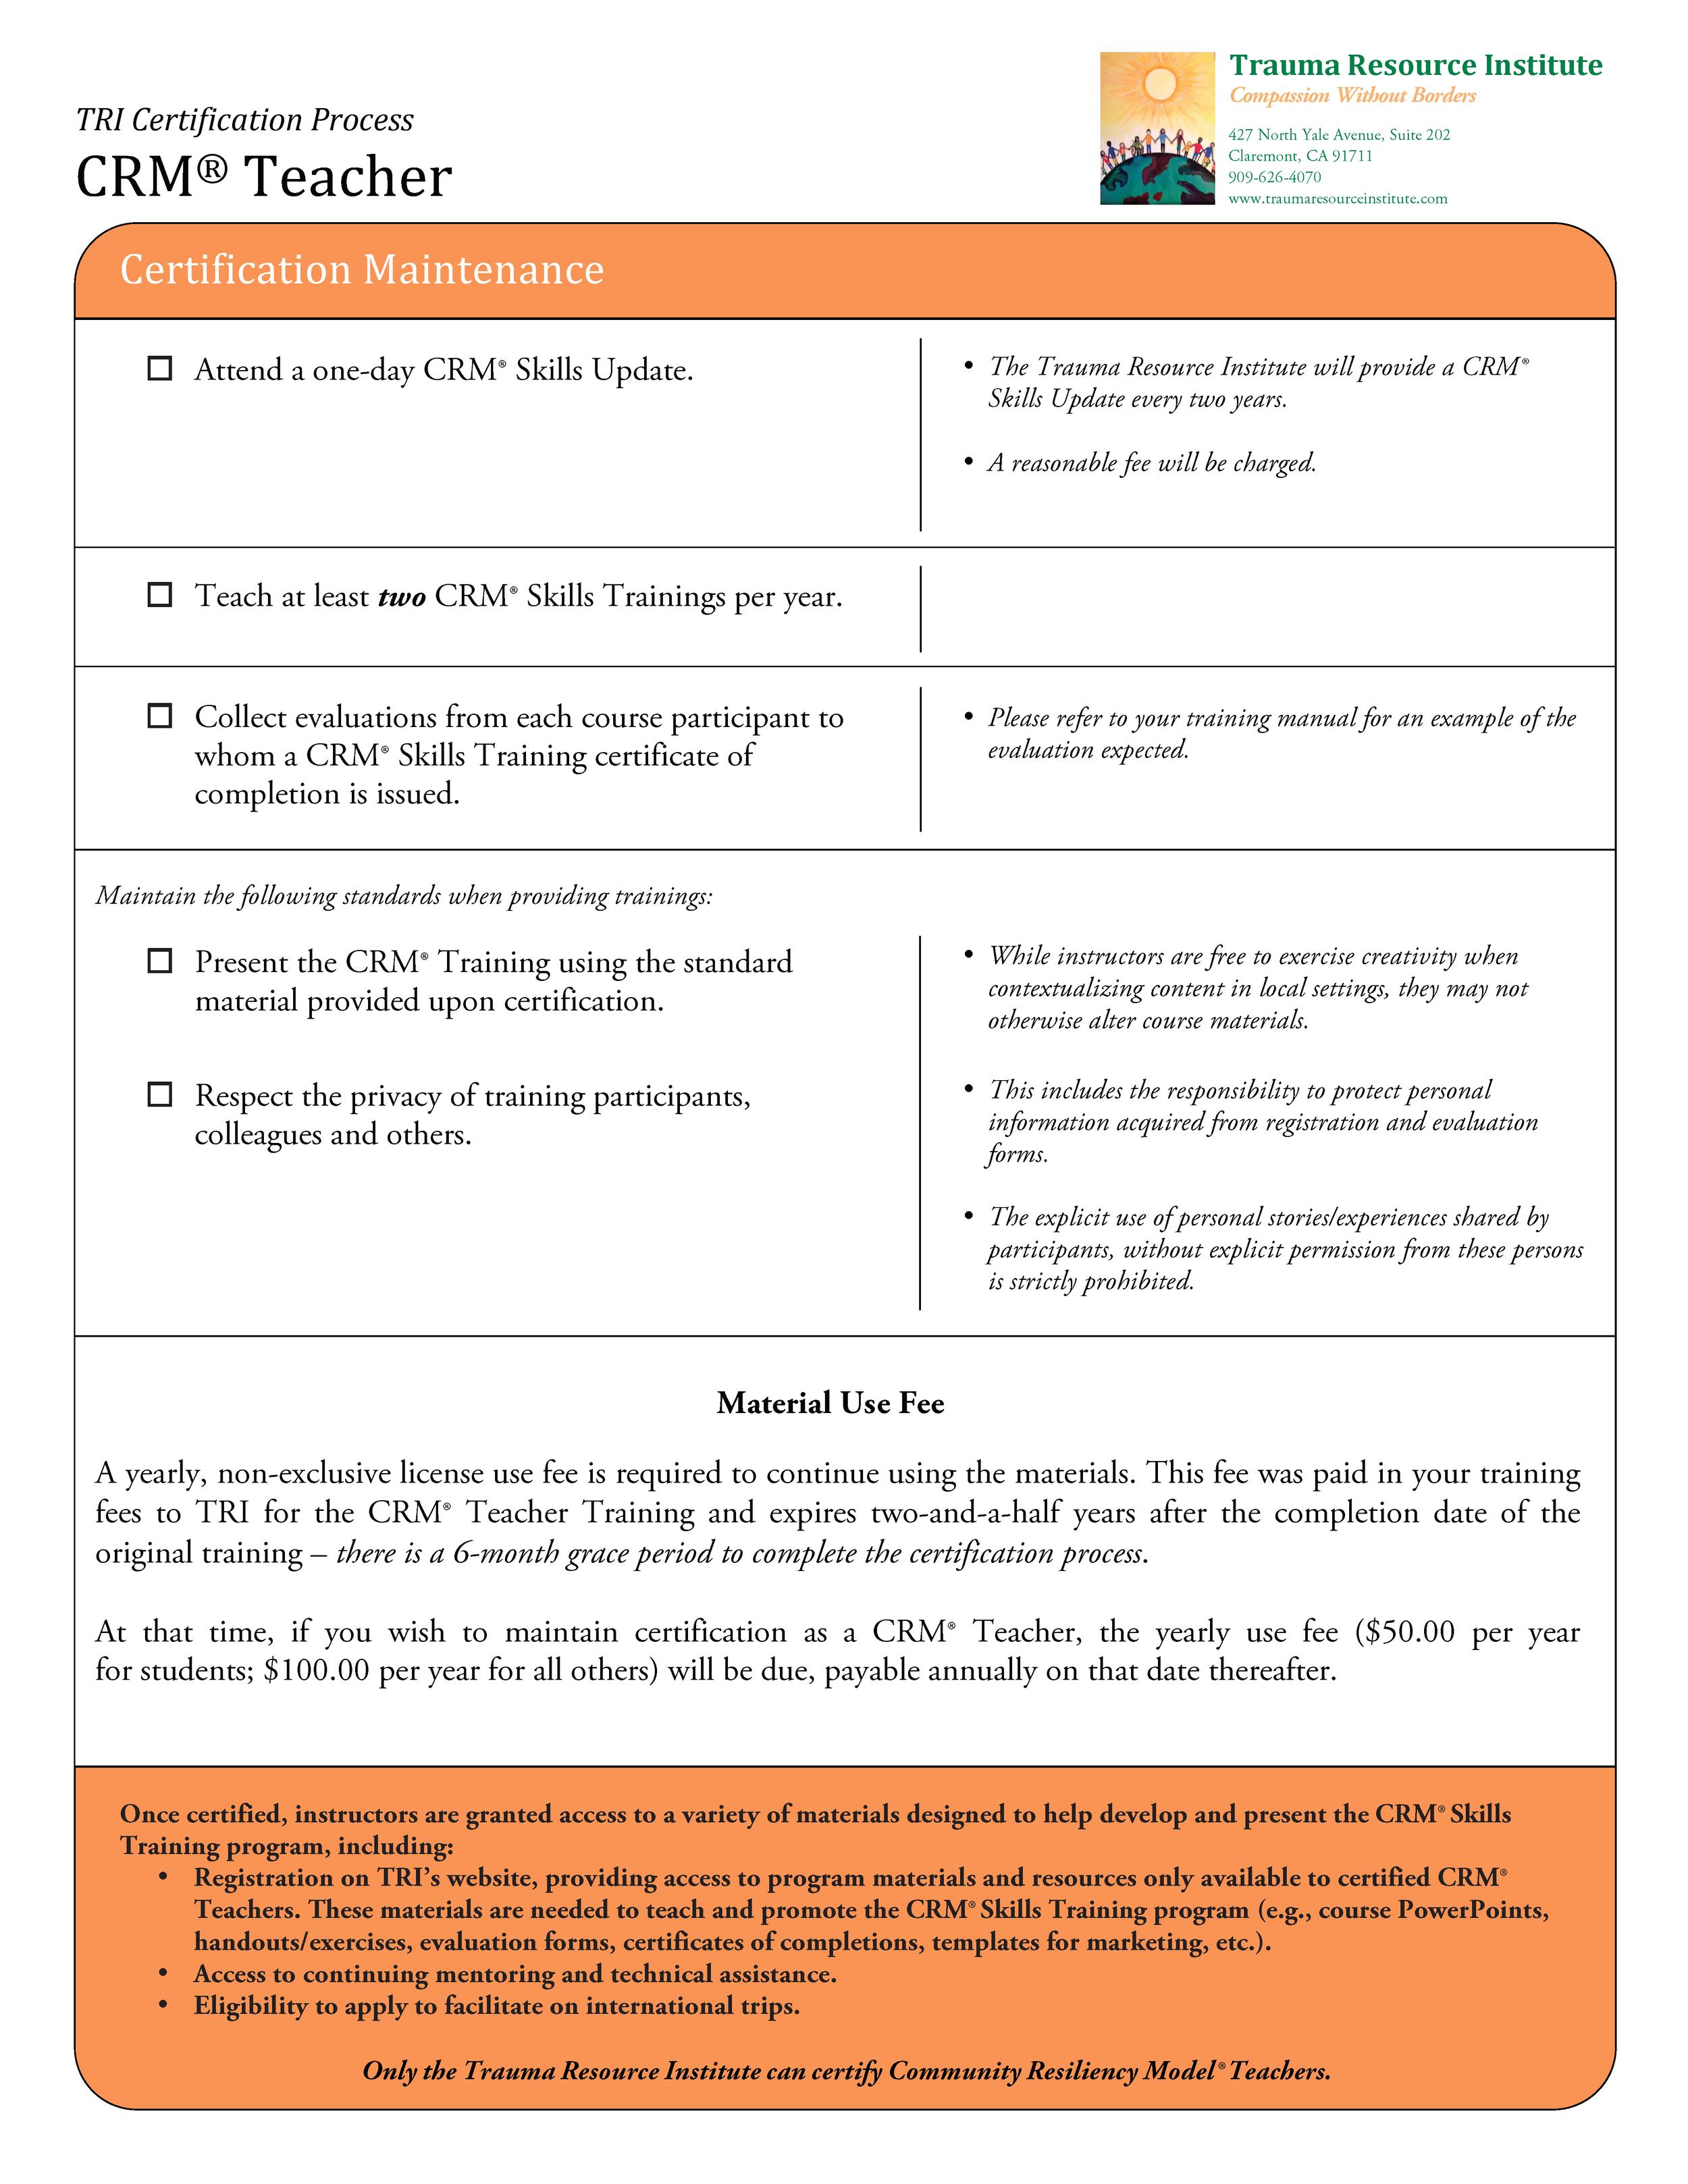 Certification Maintenance Requirements